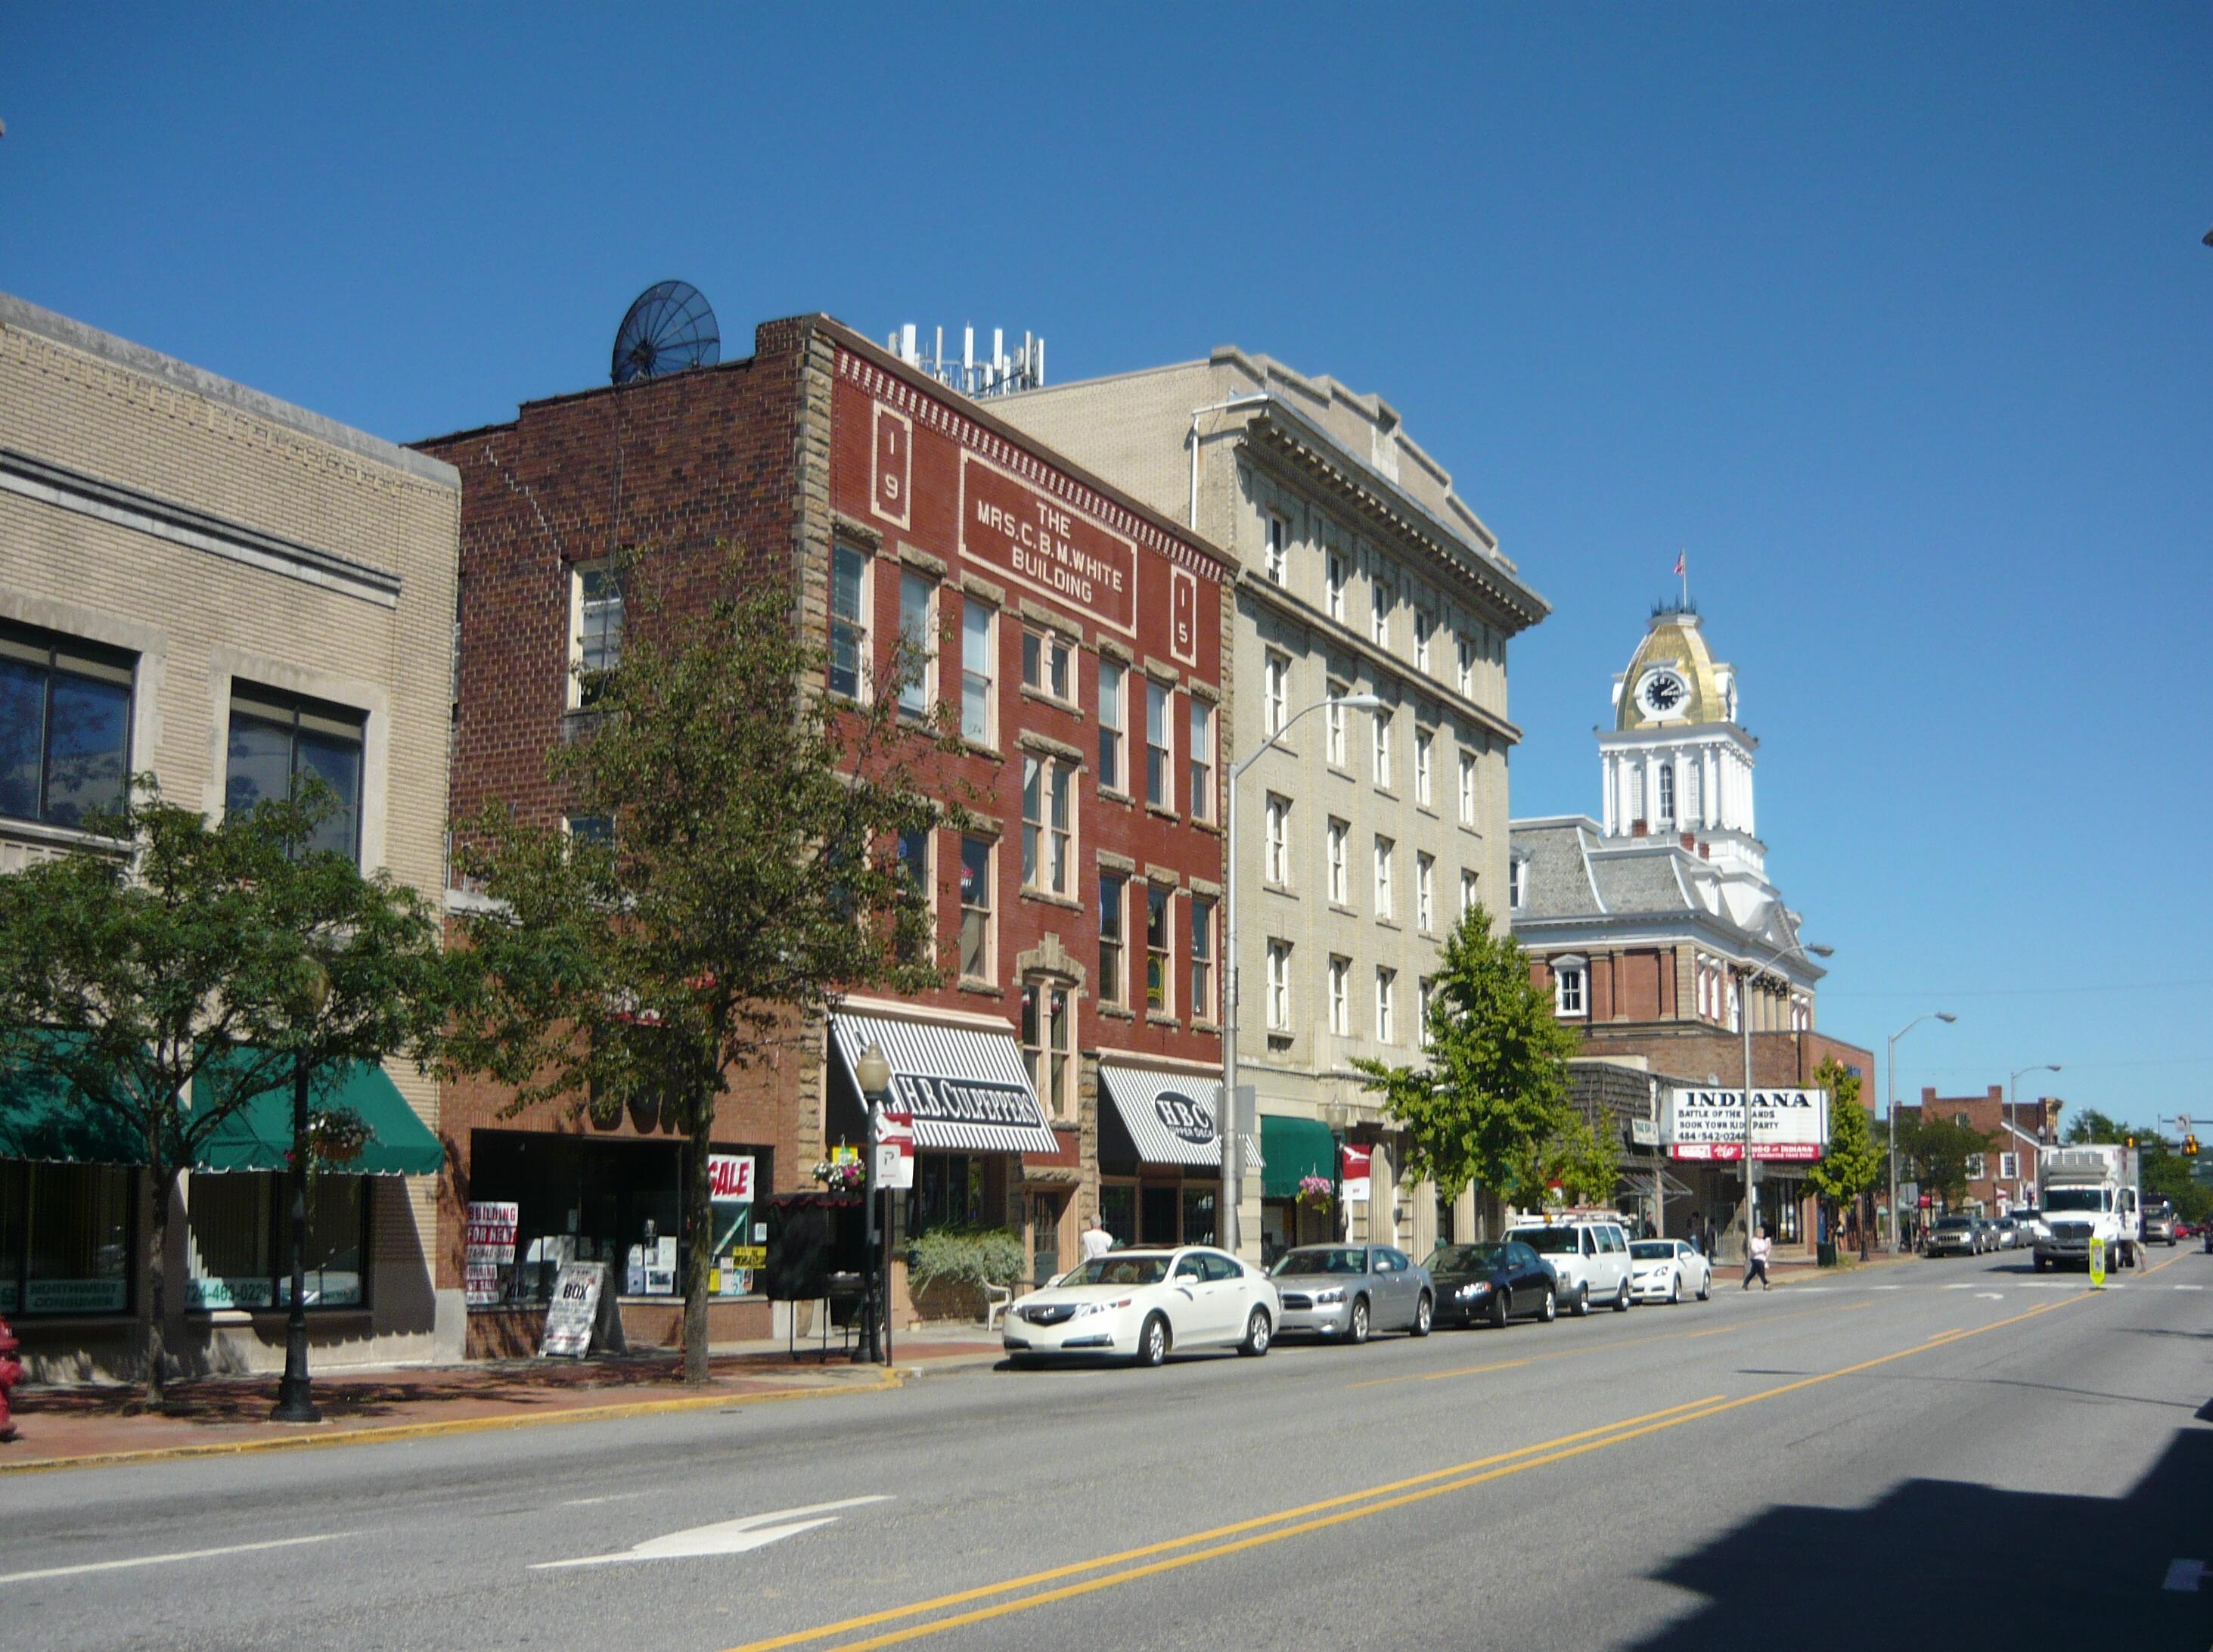 Florida Street Huntington Beach Ca